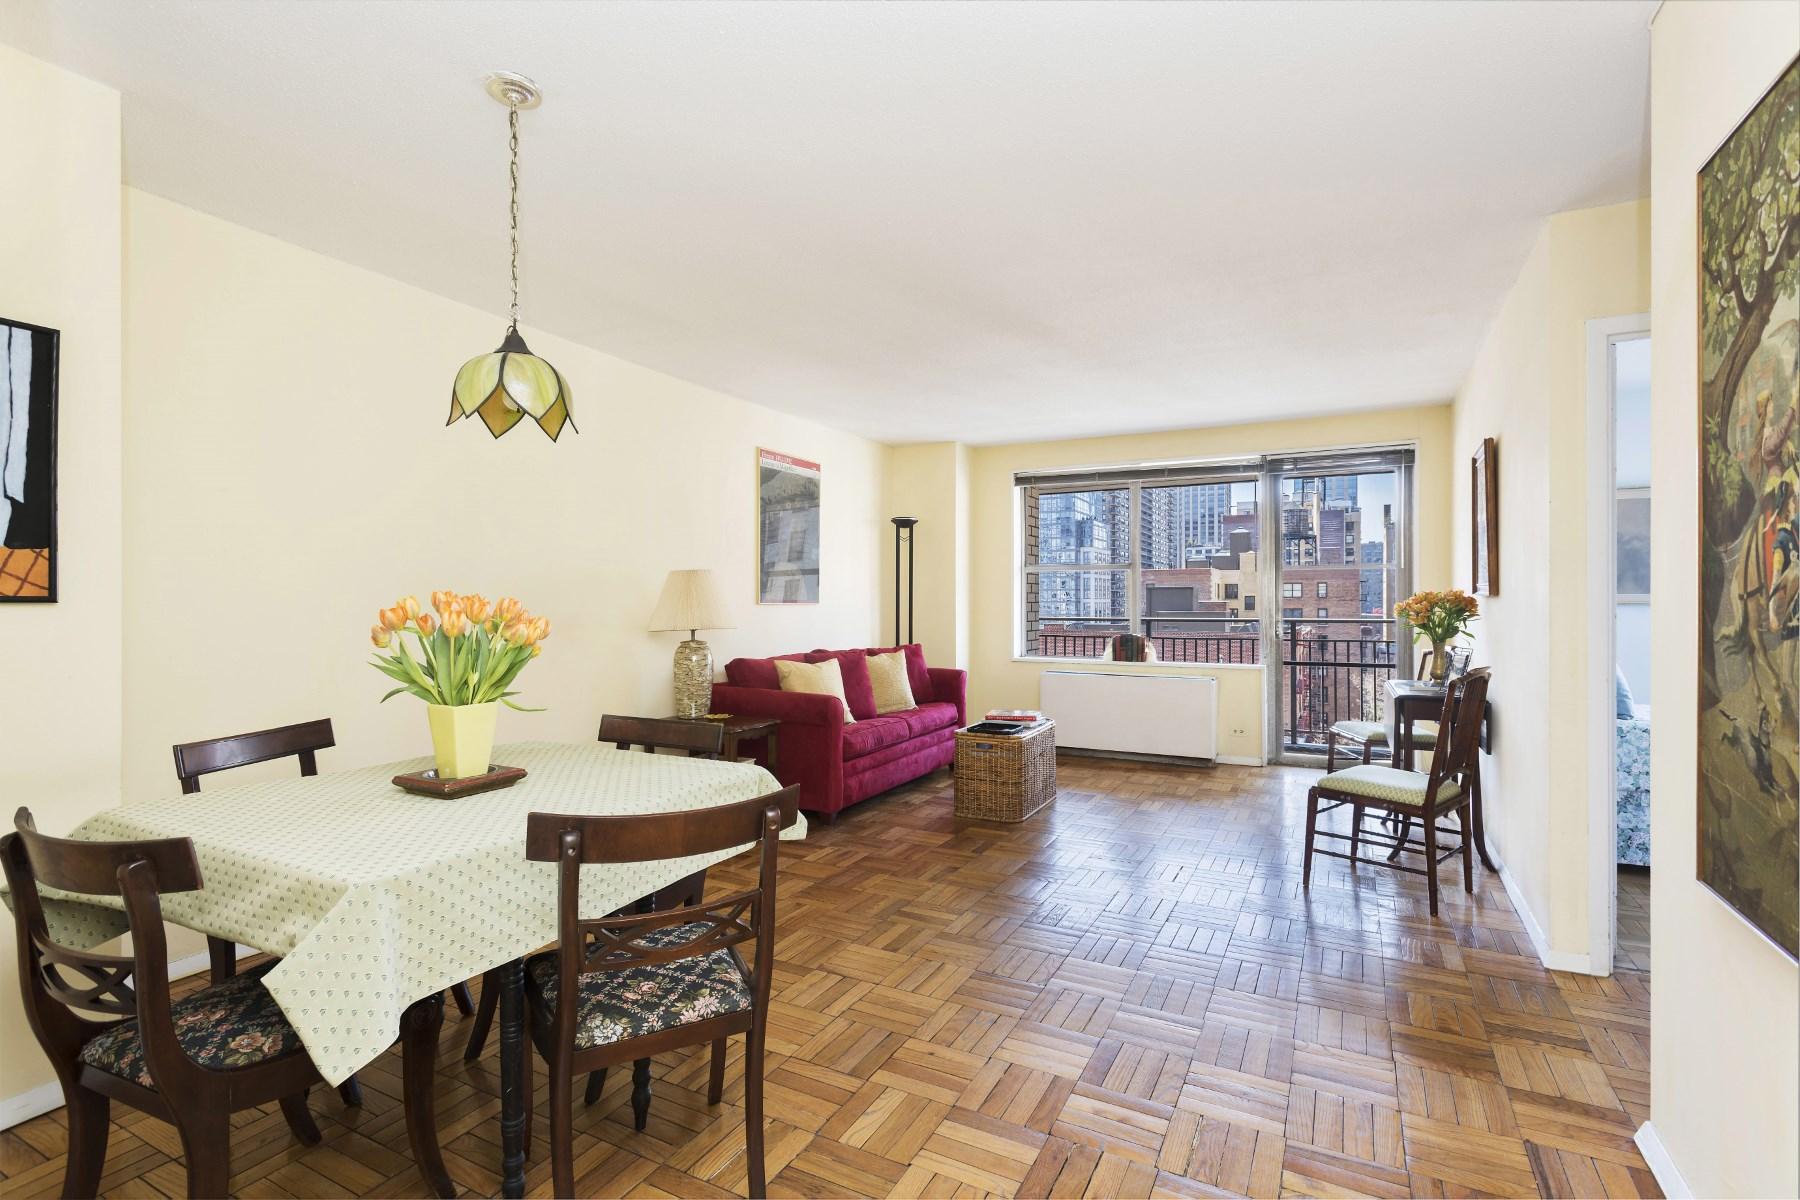 共有 為 出售 在 201 West 70th Street: One Sherman Square 201 West 70th Street Apt 9l New York, 紐約州 10023 美國